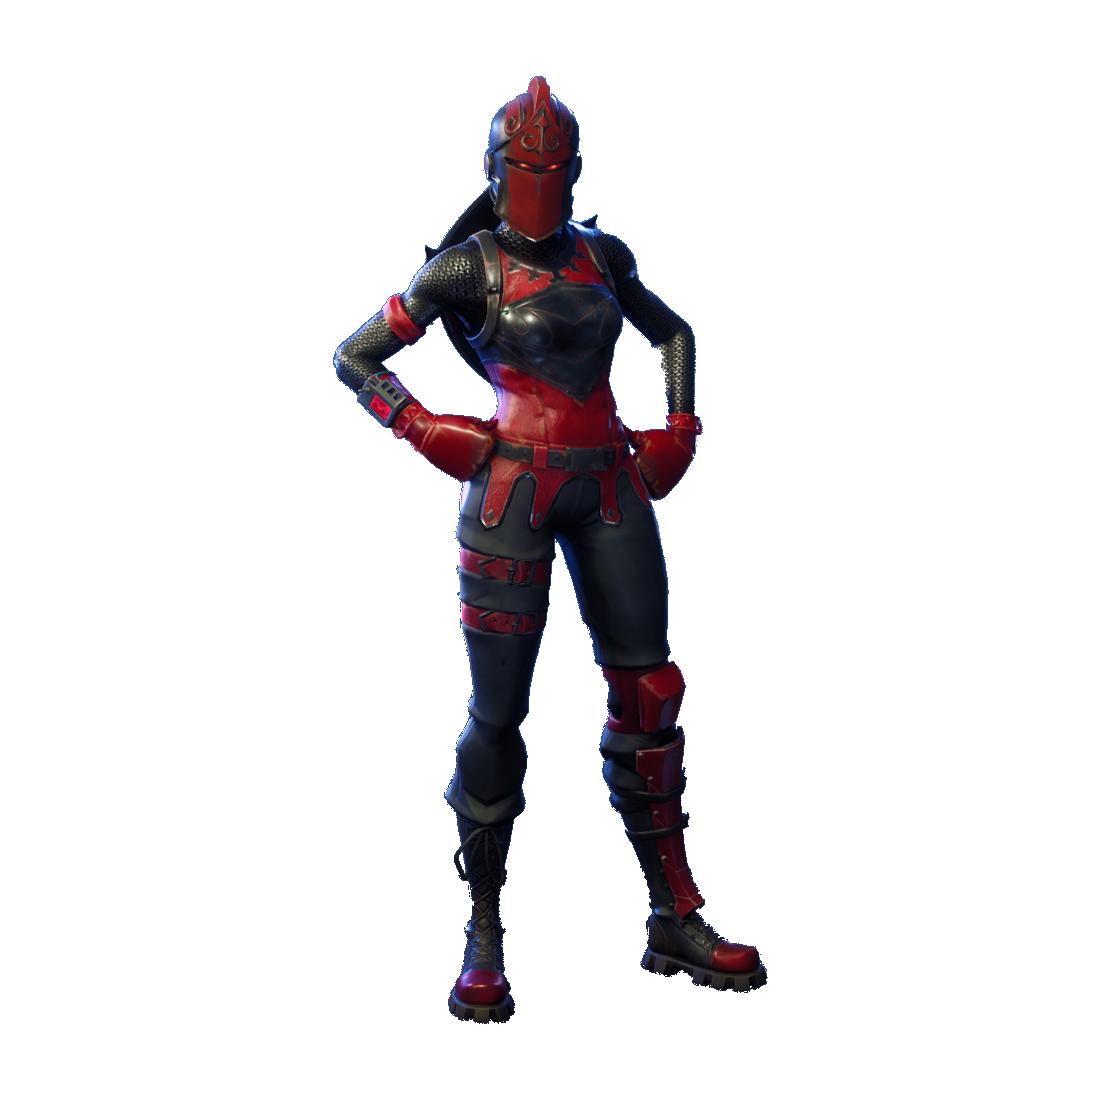 Red Knight - Red Knight (Красный рыцарь)